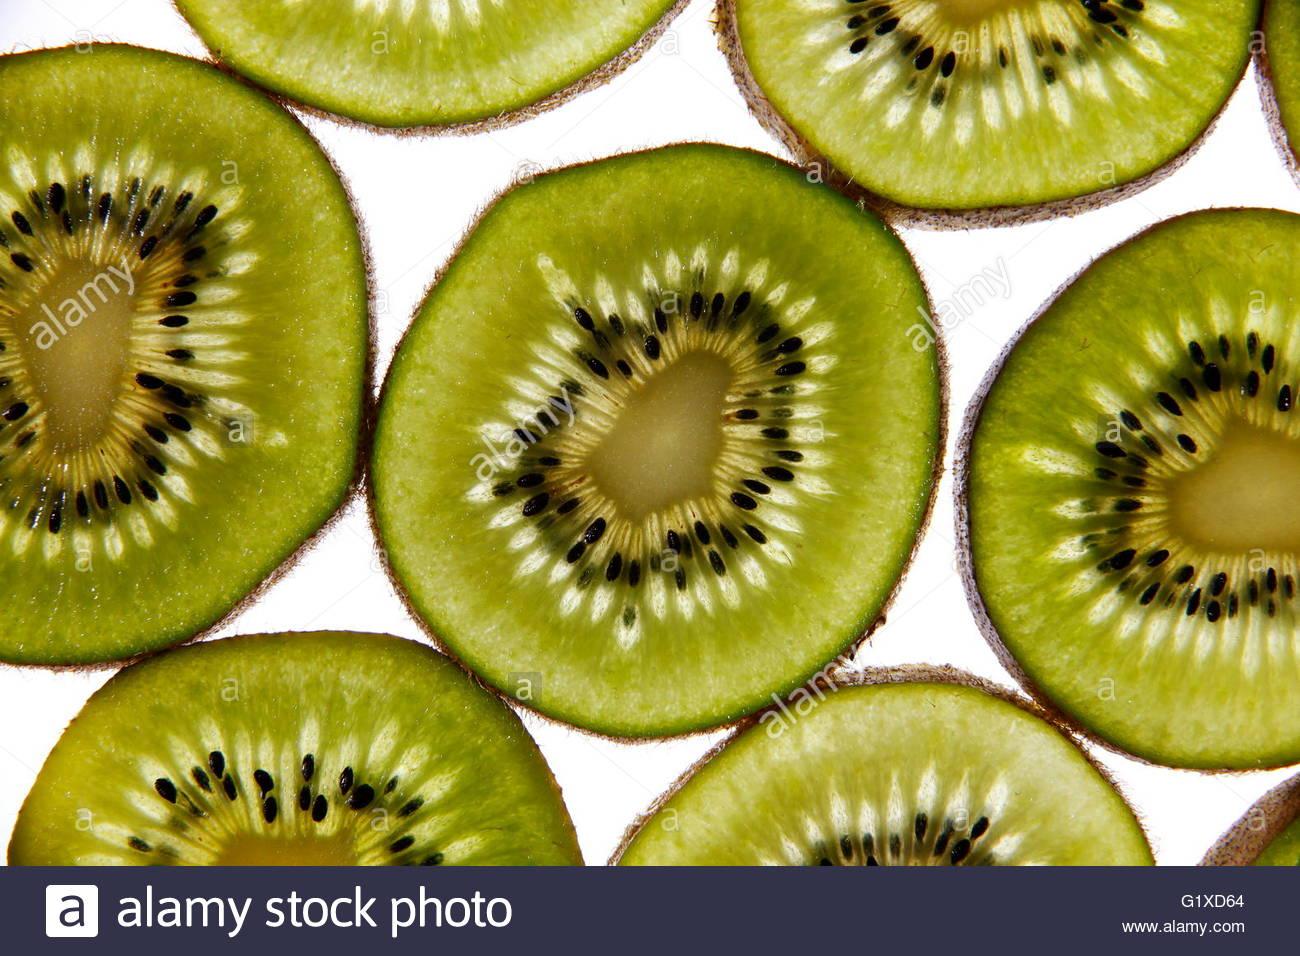 In macro photography studio environment was sliced kiwi fruit - Stock Image